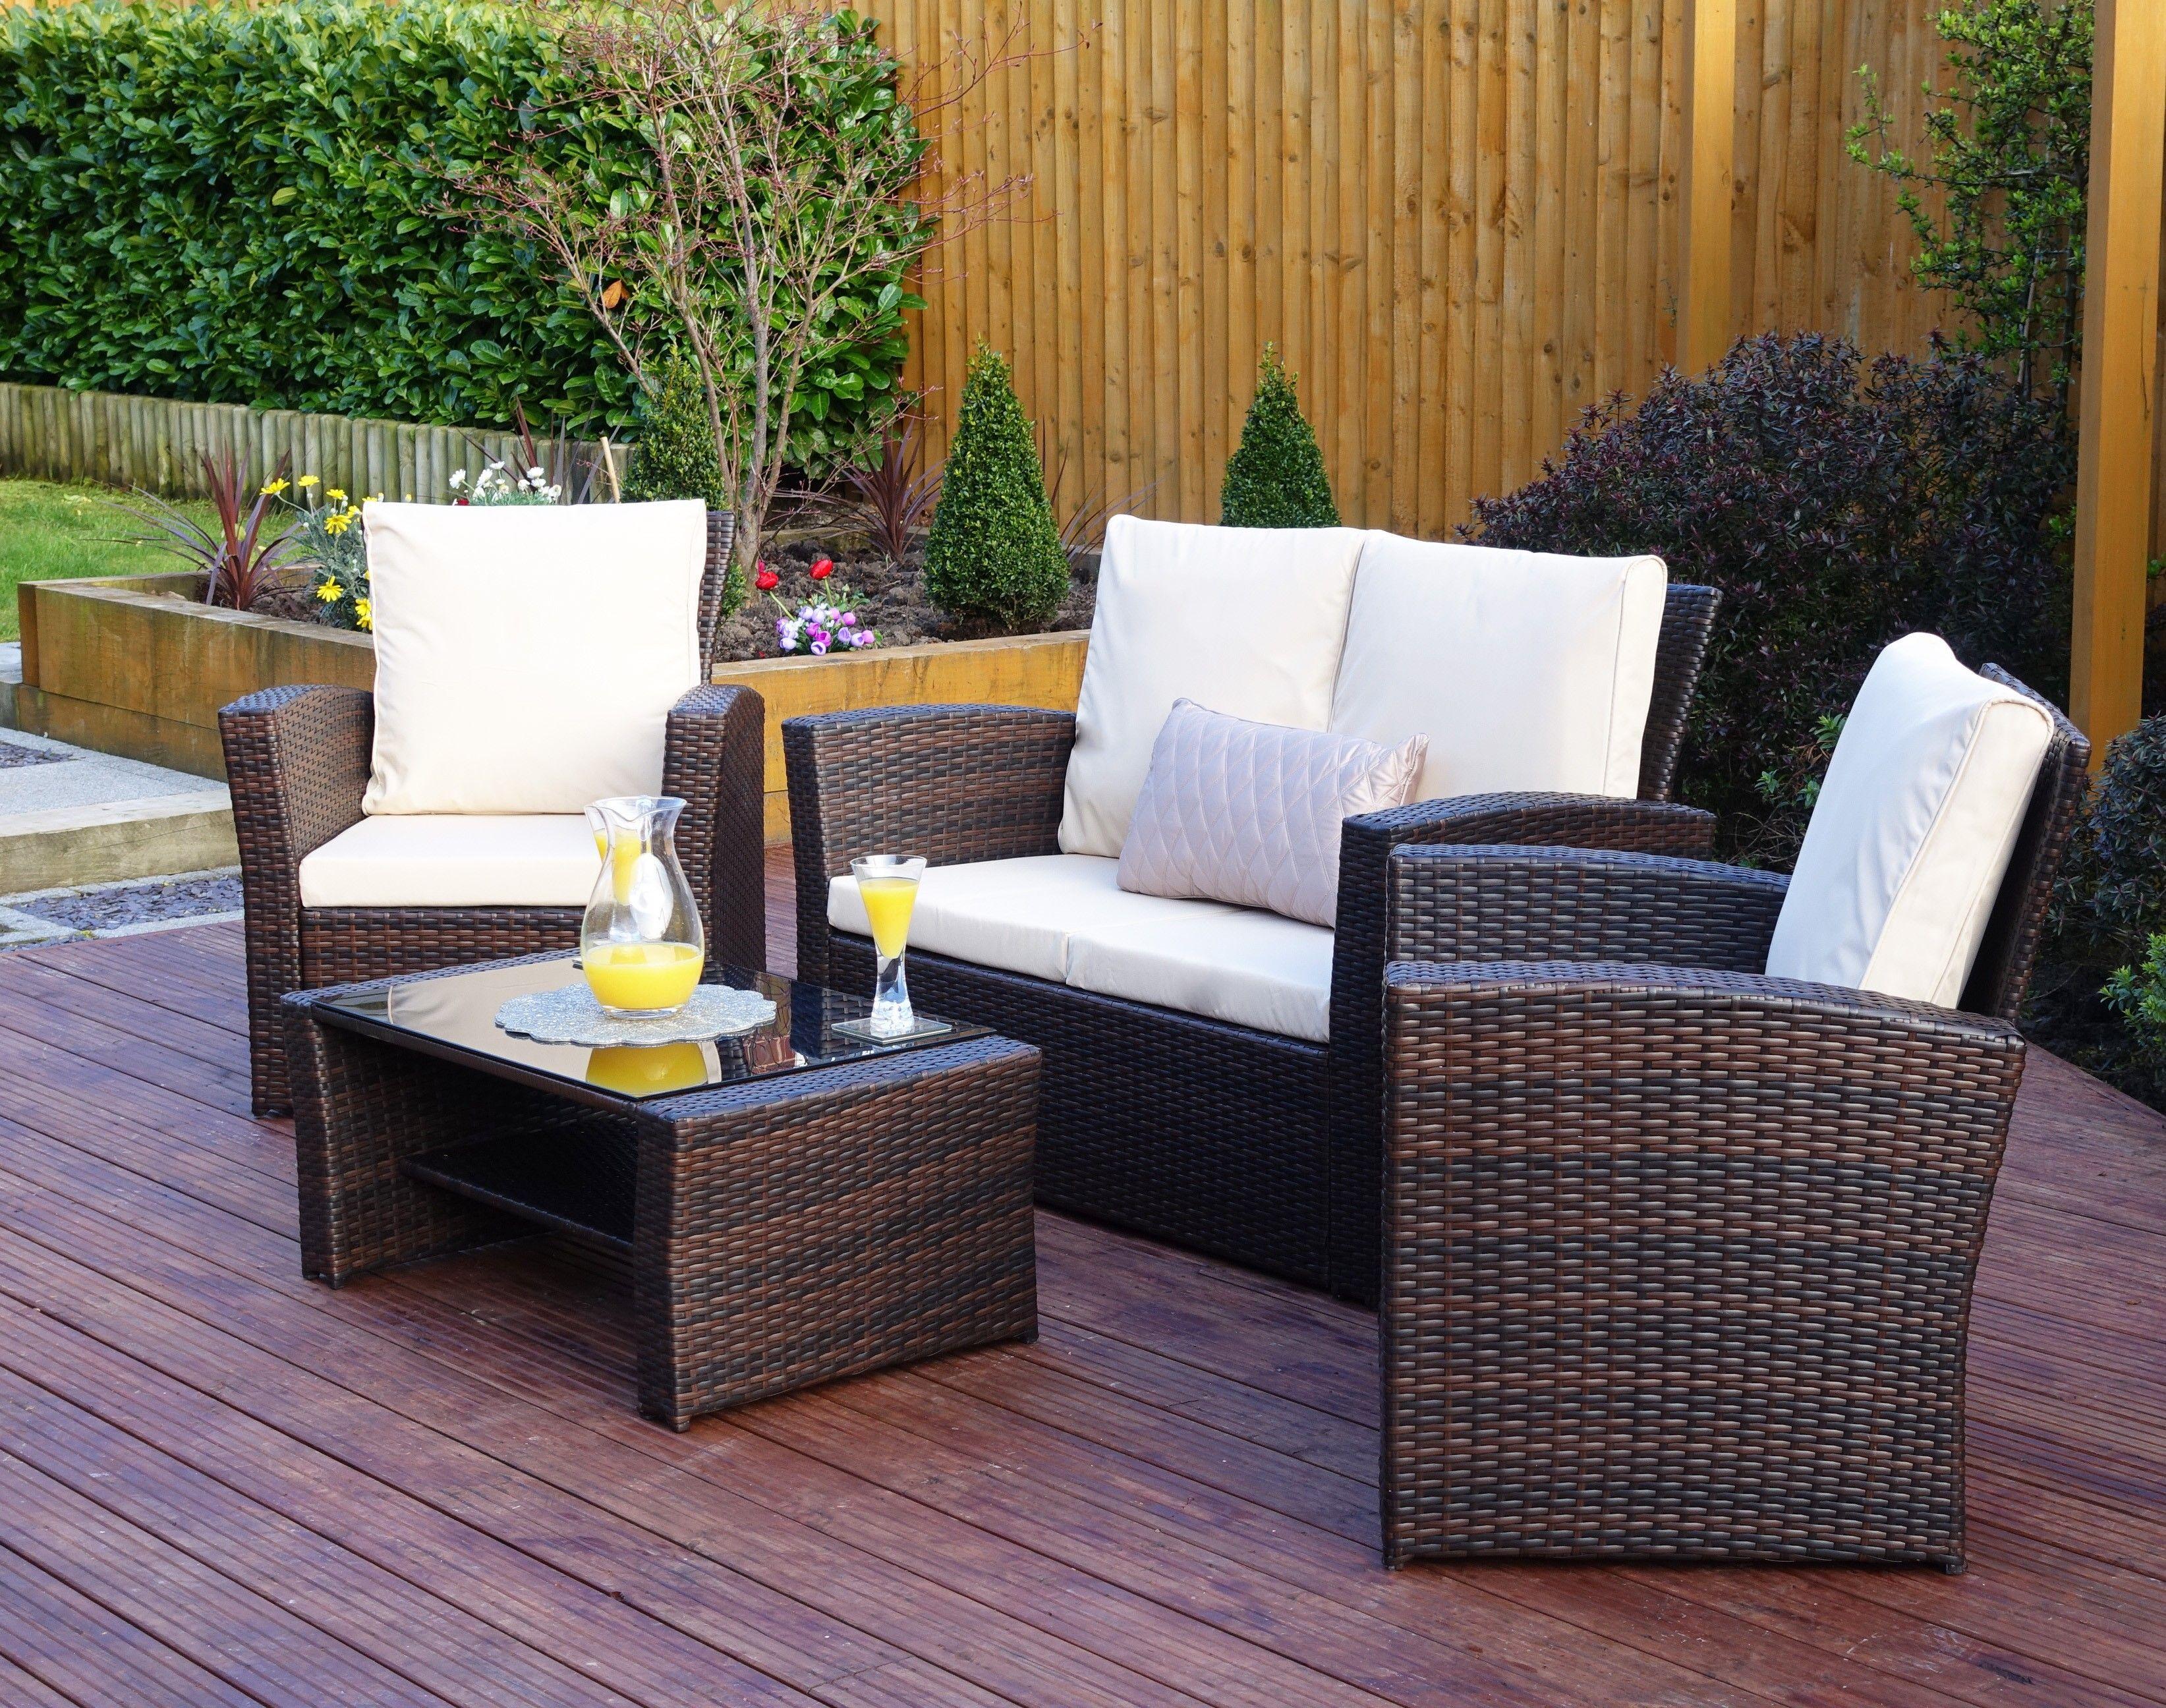 Algarve Sofa Set Rattan Outdoor Furniture Pallet Garden inside sizing 3287 X 2592